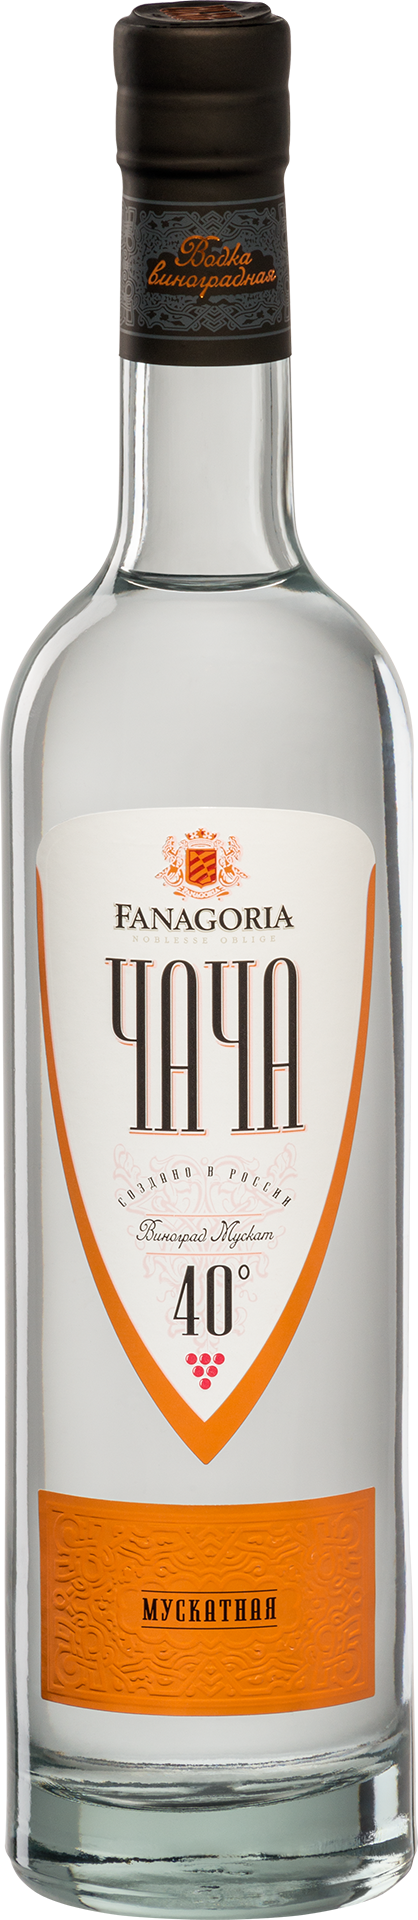 Чача — грузинский напиток из винограда